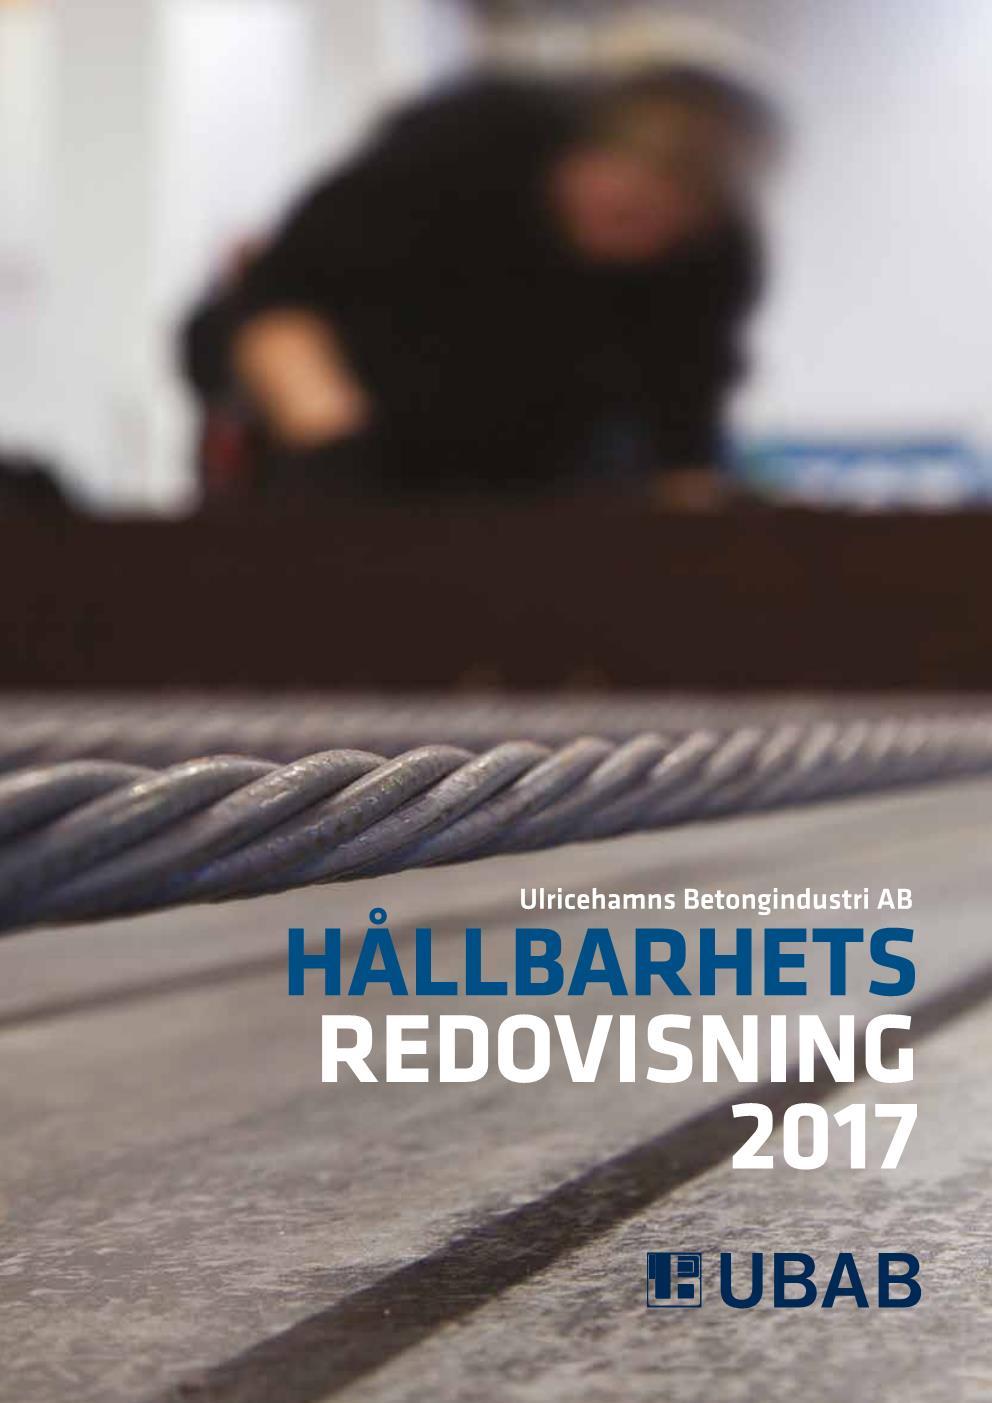 UBAB Hållbarhetsredovisning 2018_webres Sida 001